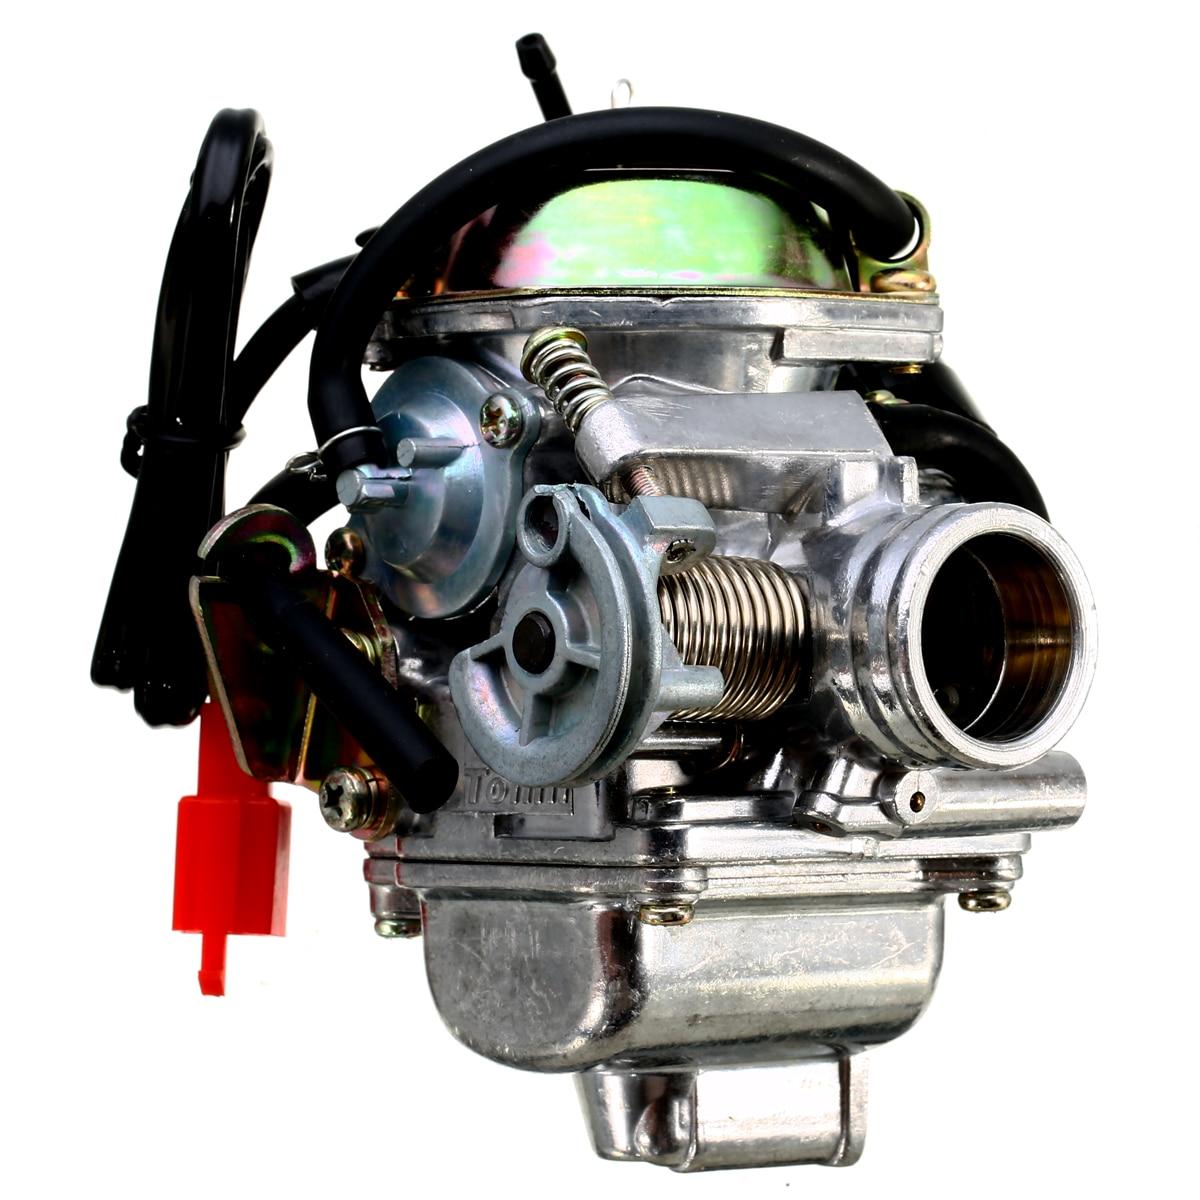 24 мм карбюратор мотоцикла Carb 4-тактный GY6 110/125/150cc Скутер мопед ATV картинг для Yamaha Suzuki Kawasaki